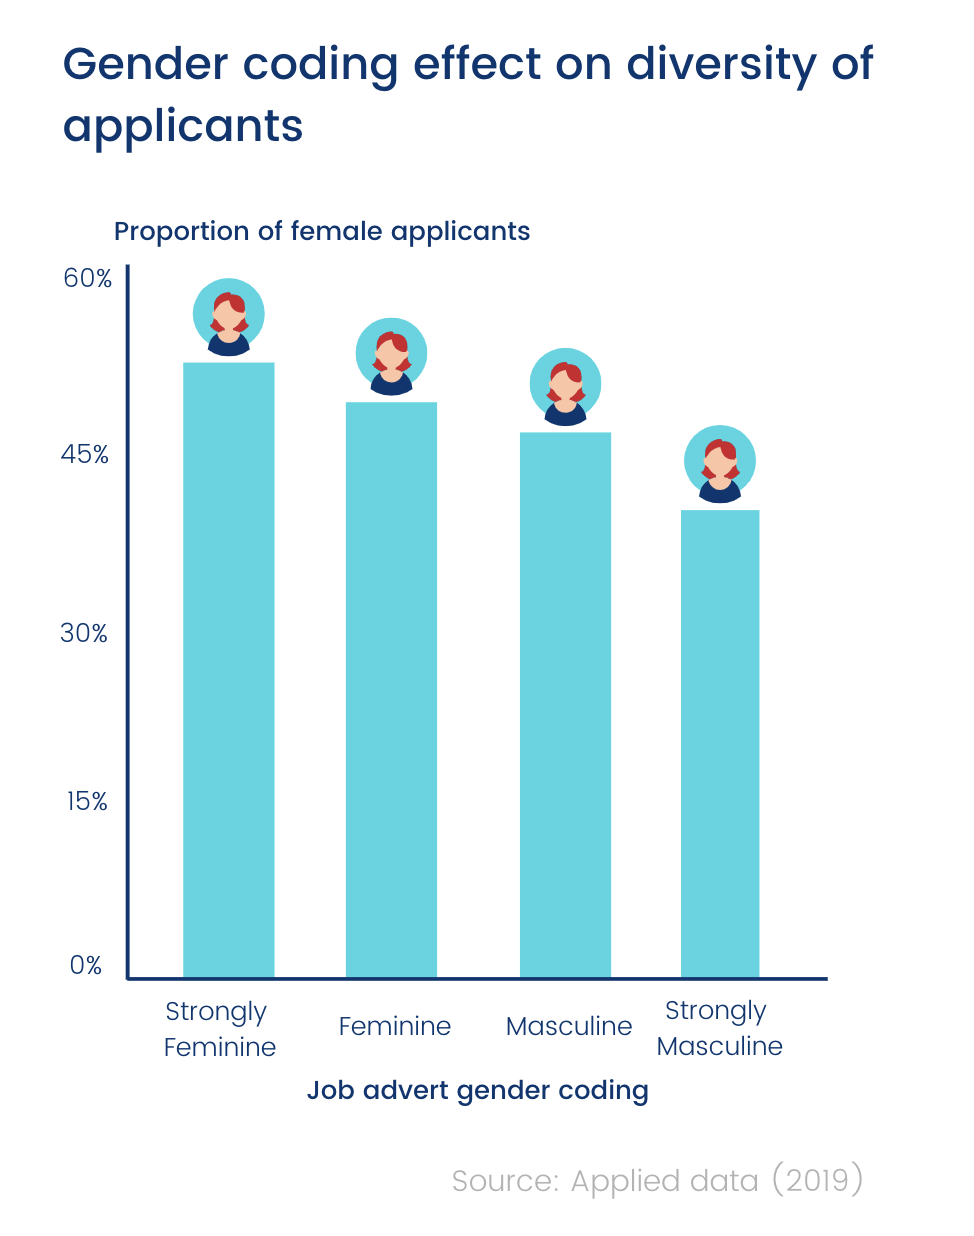 Gender coding effect on diversity of applicants